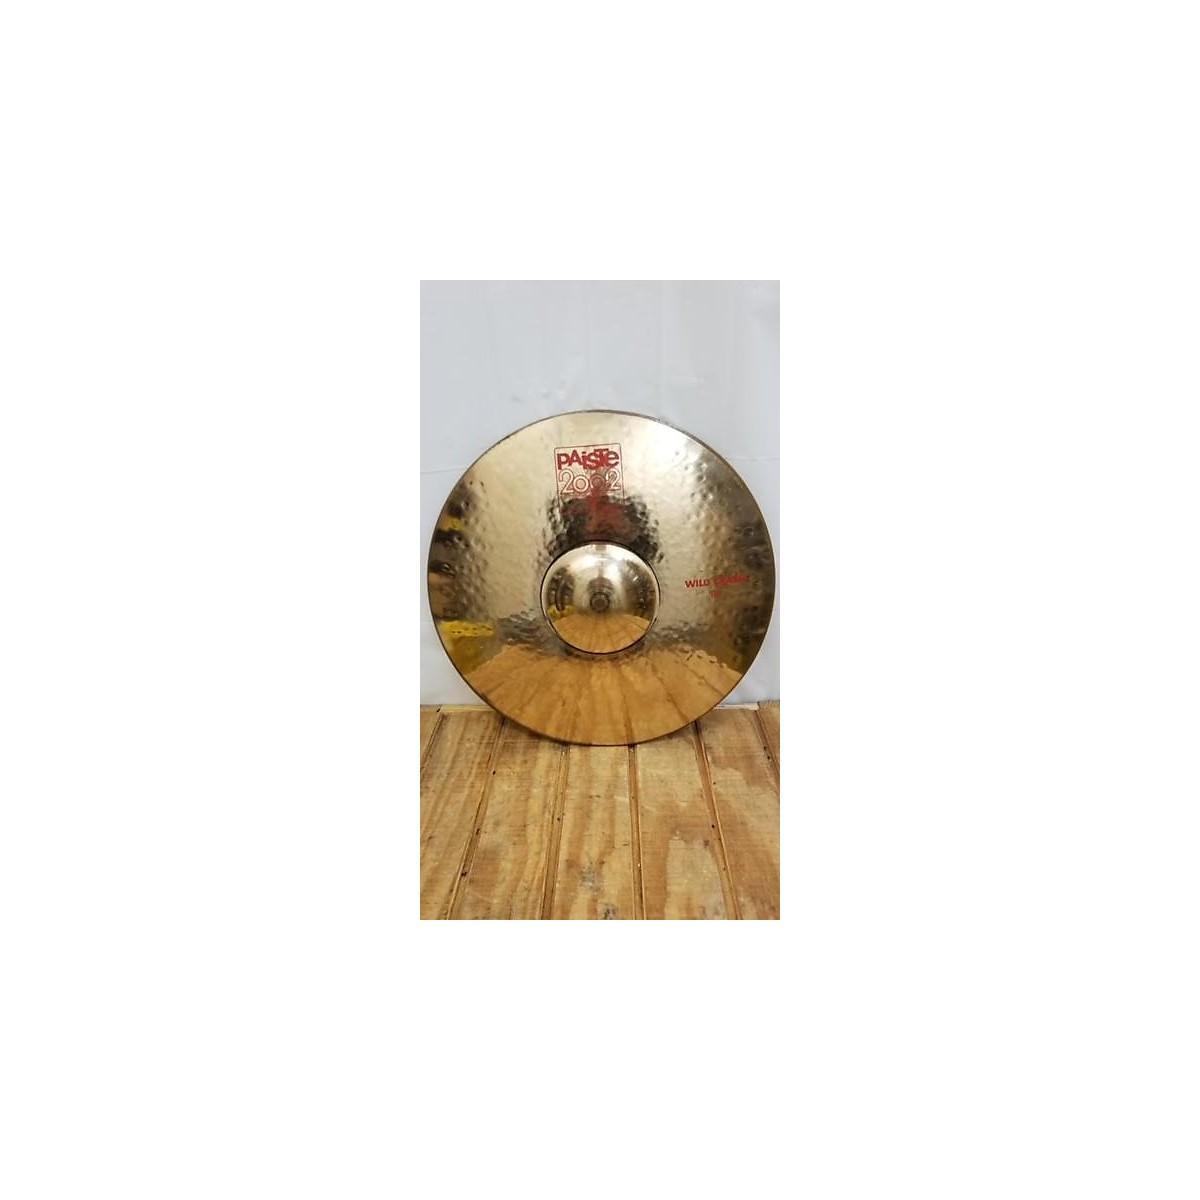 Paiste 19in Wild Crash Cymbal